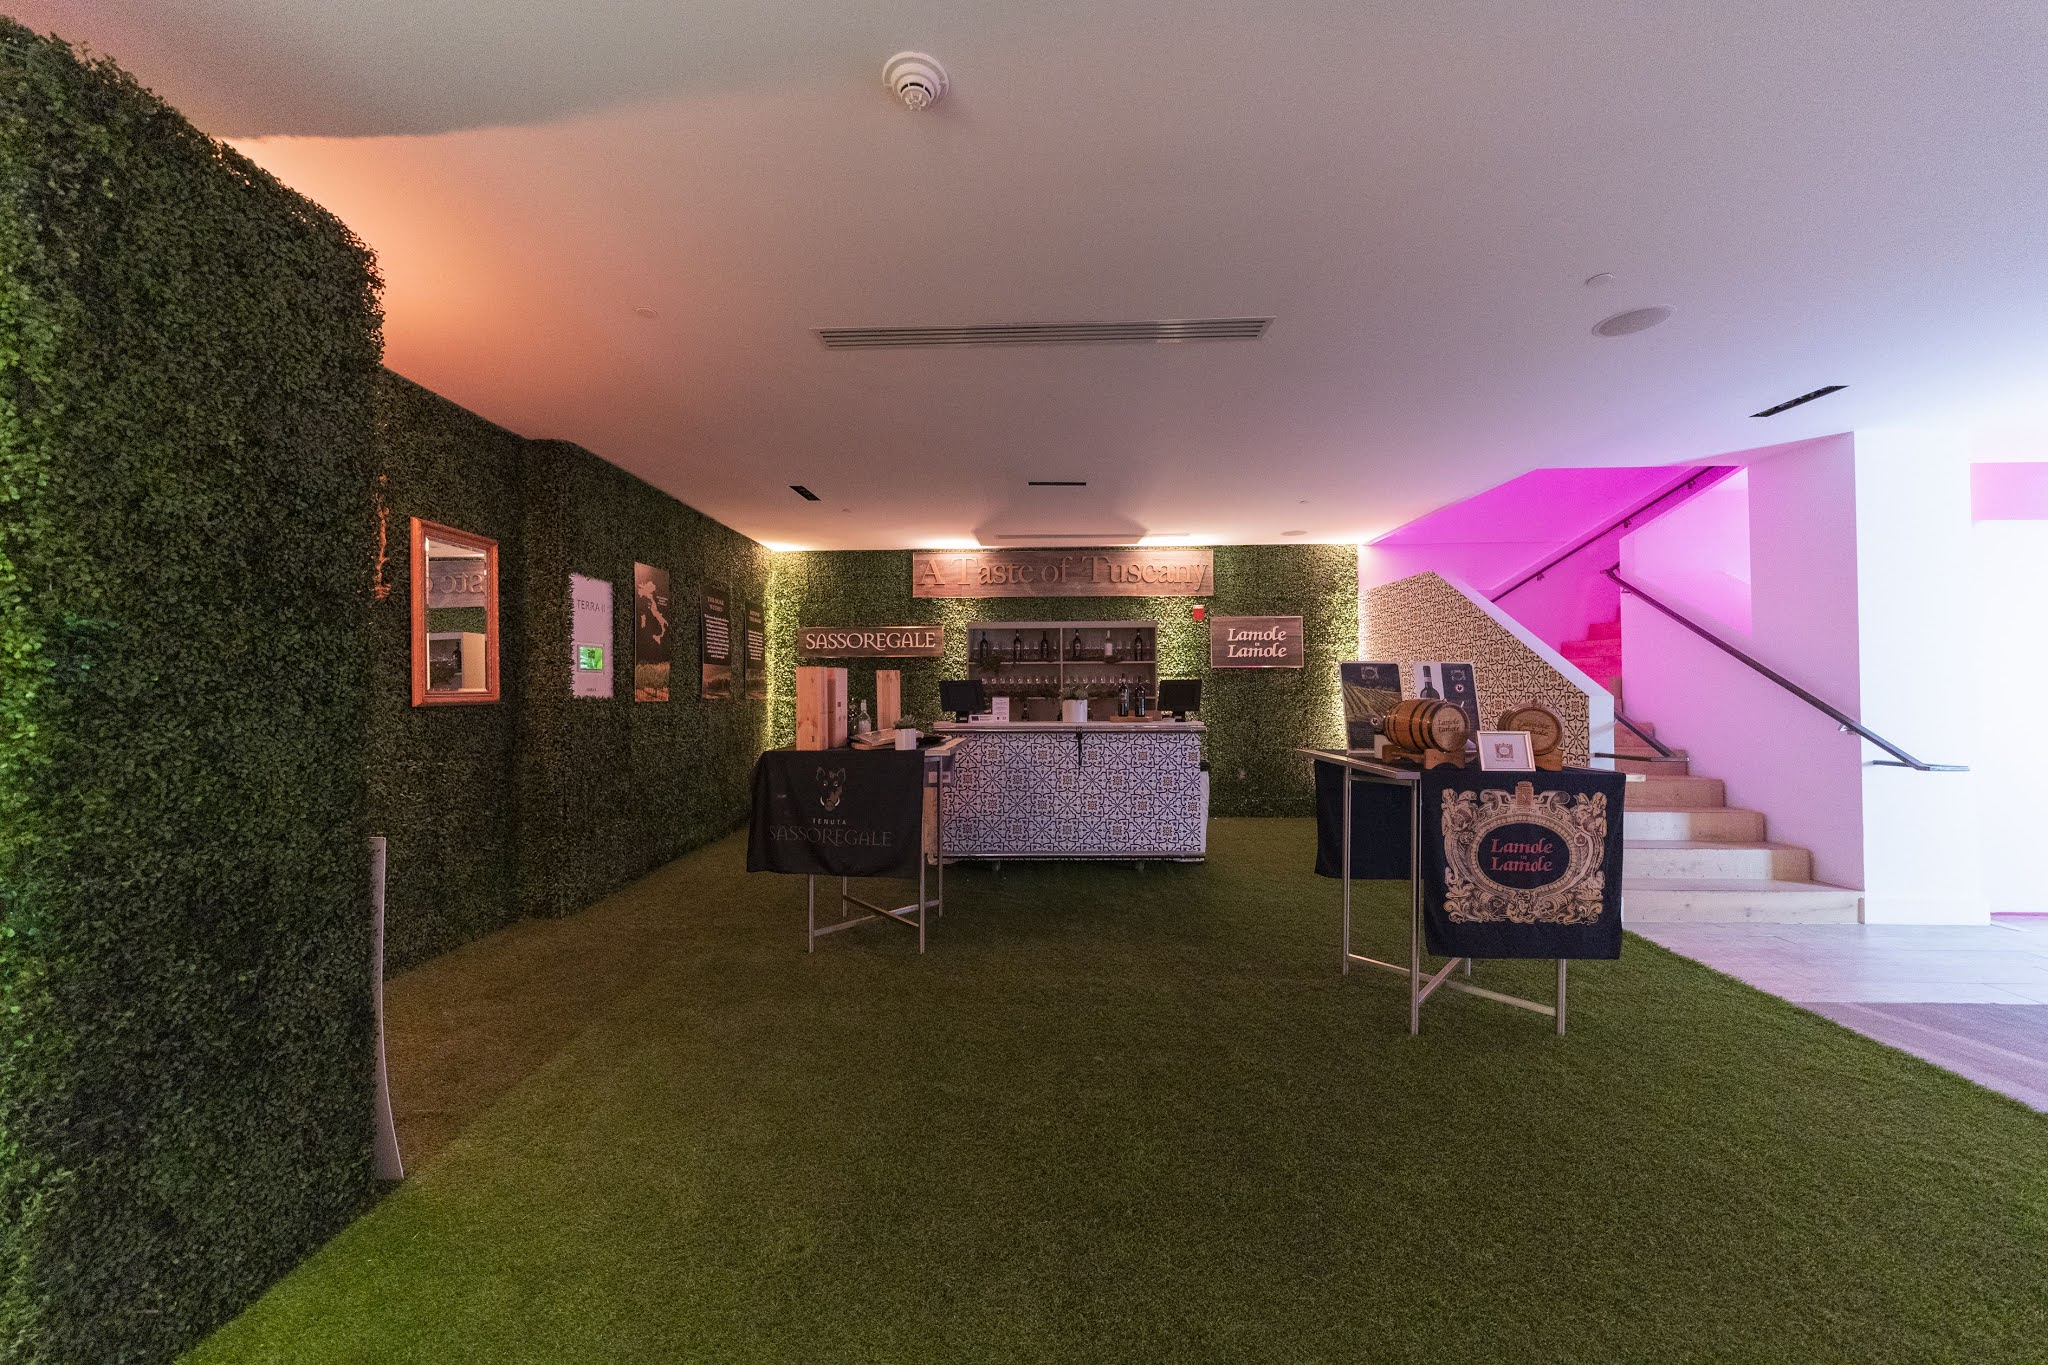 rumput dekorasi ruangan